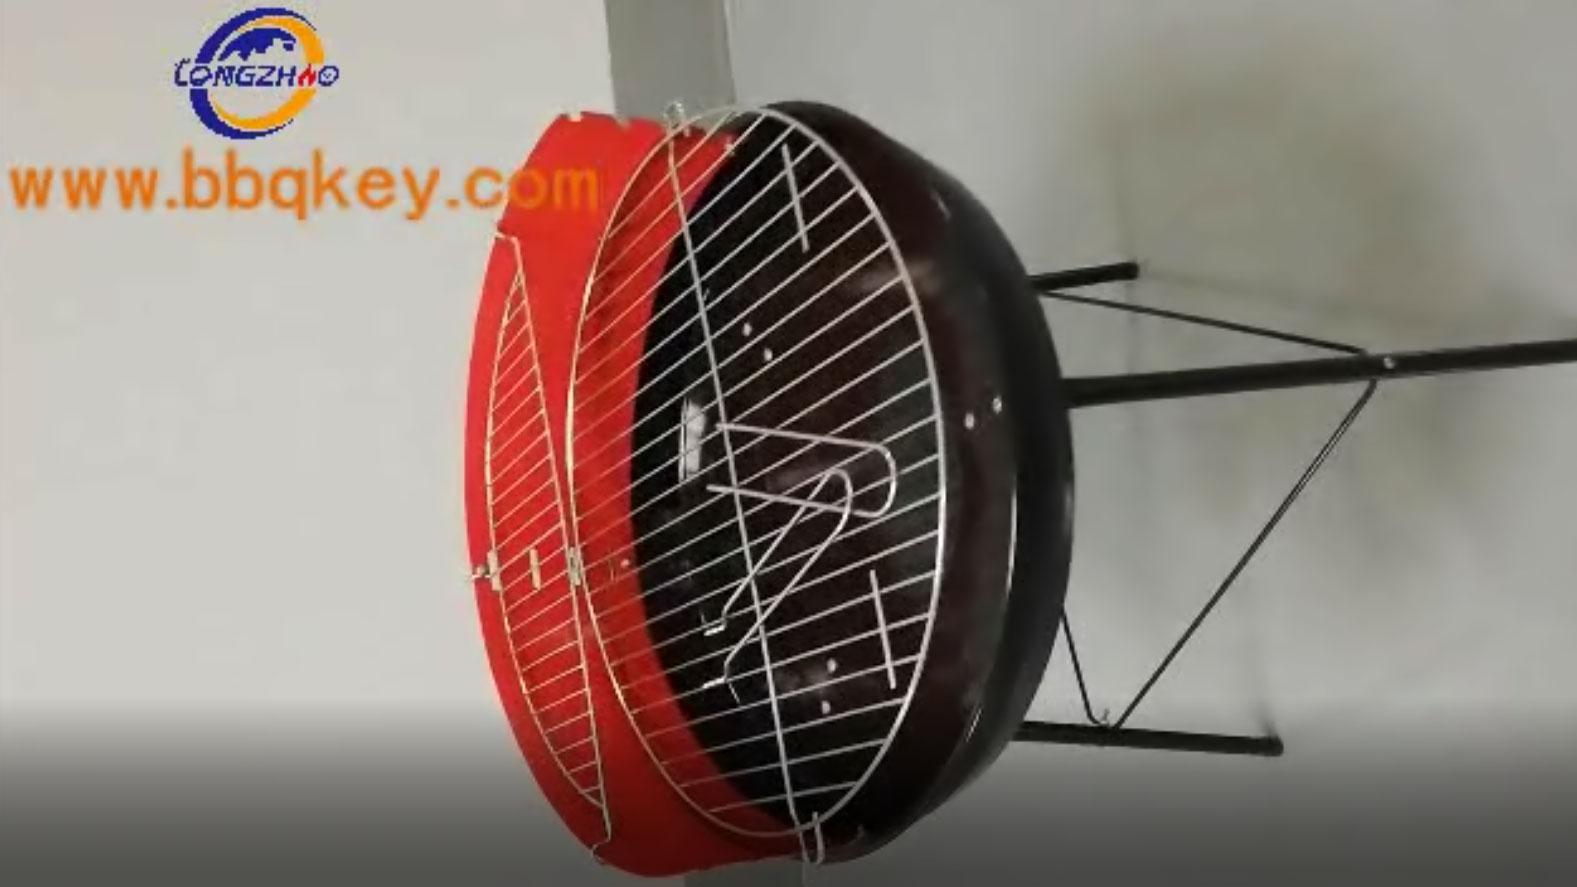 Longzhao BBQ Array image128